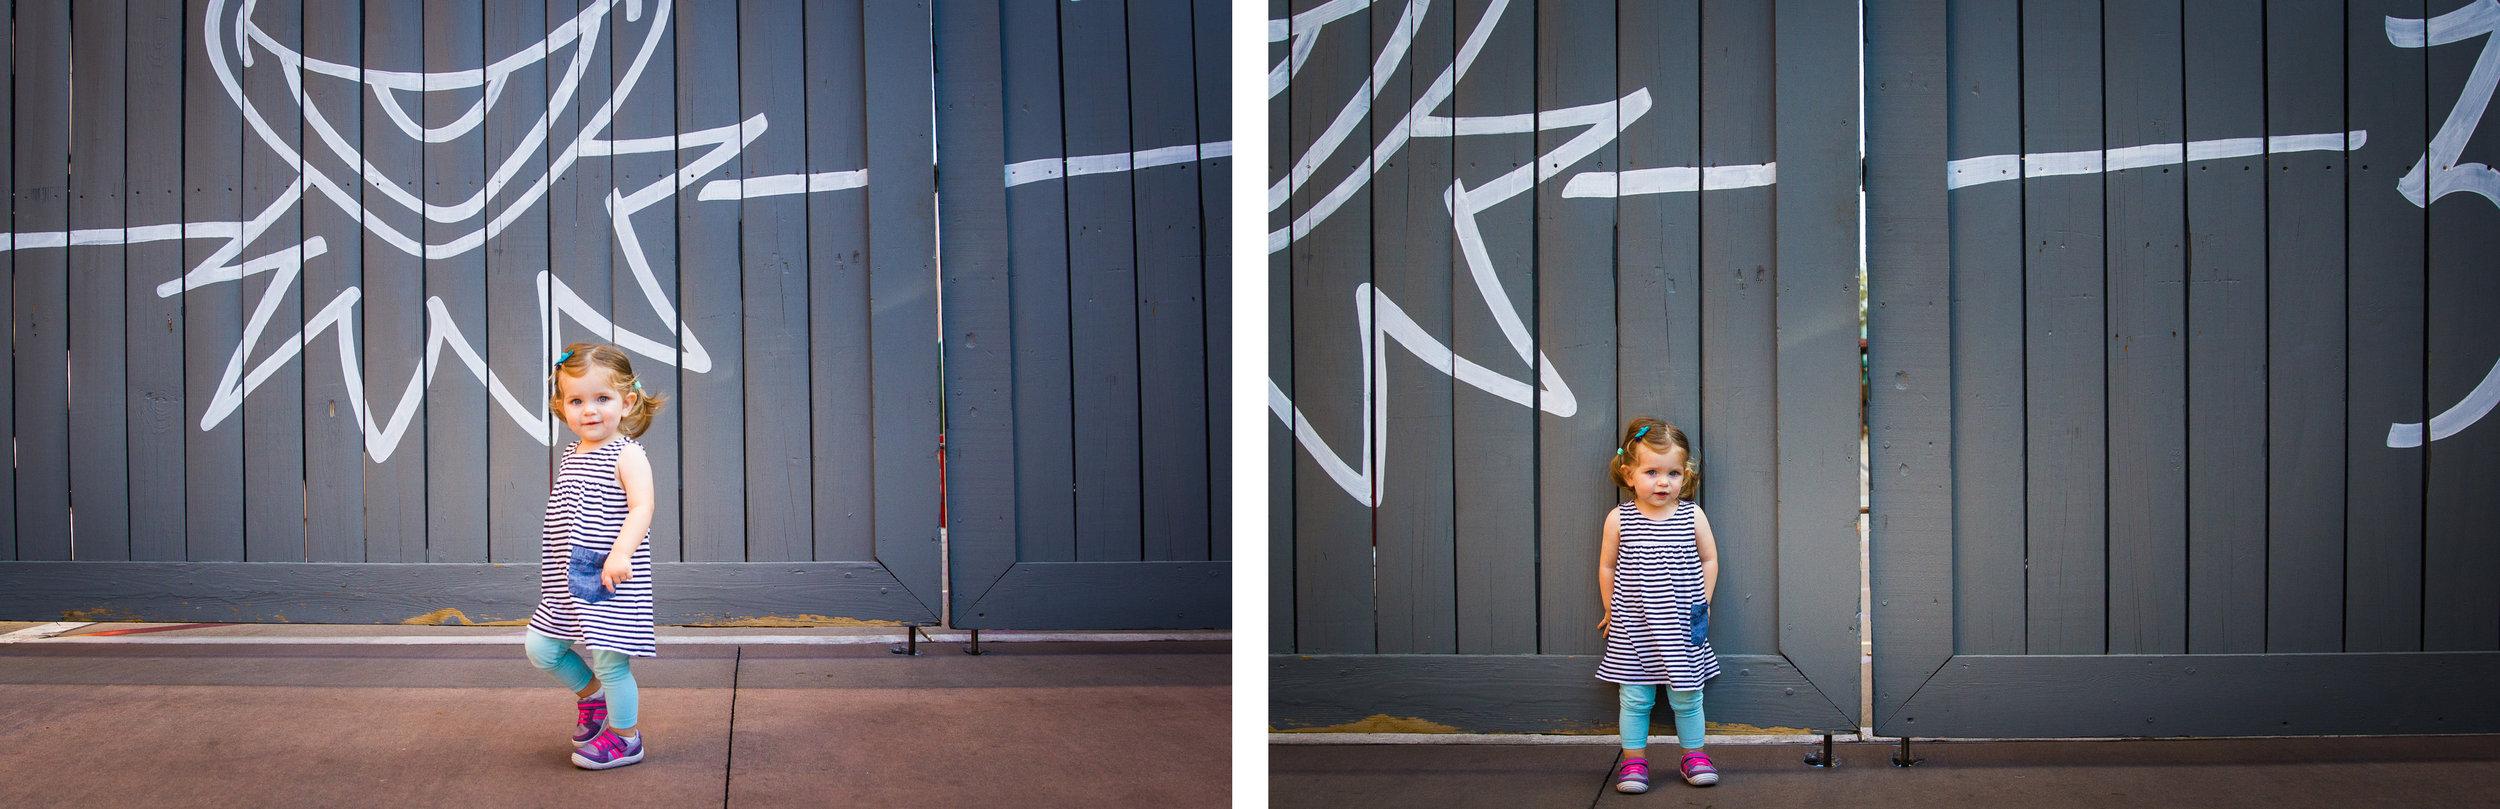 muppetvision 3d / hollywood studios / disney family photographer